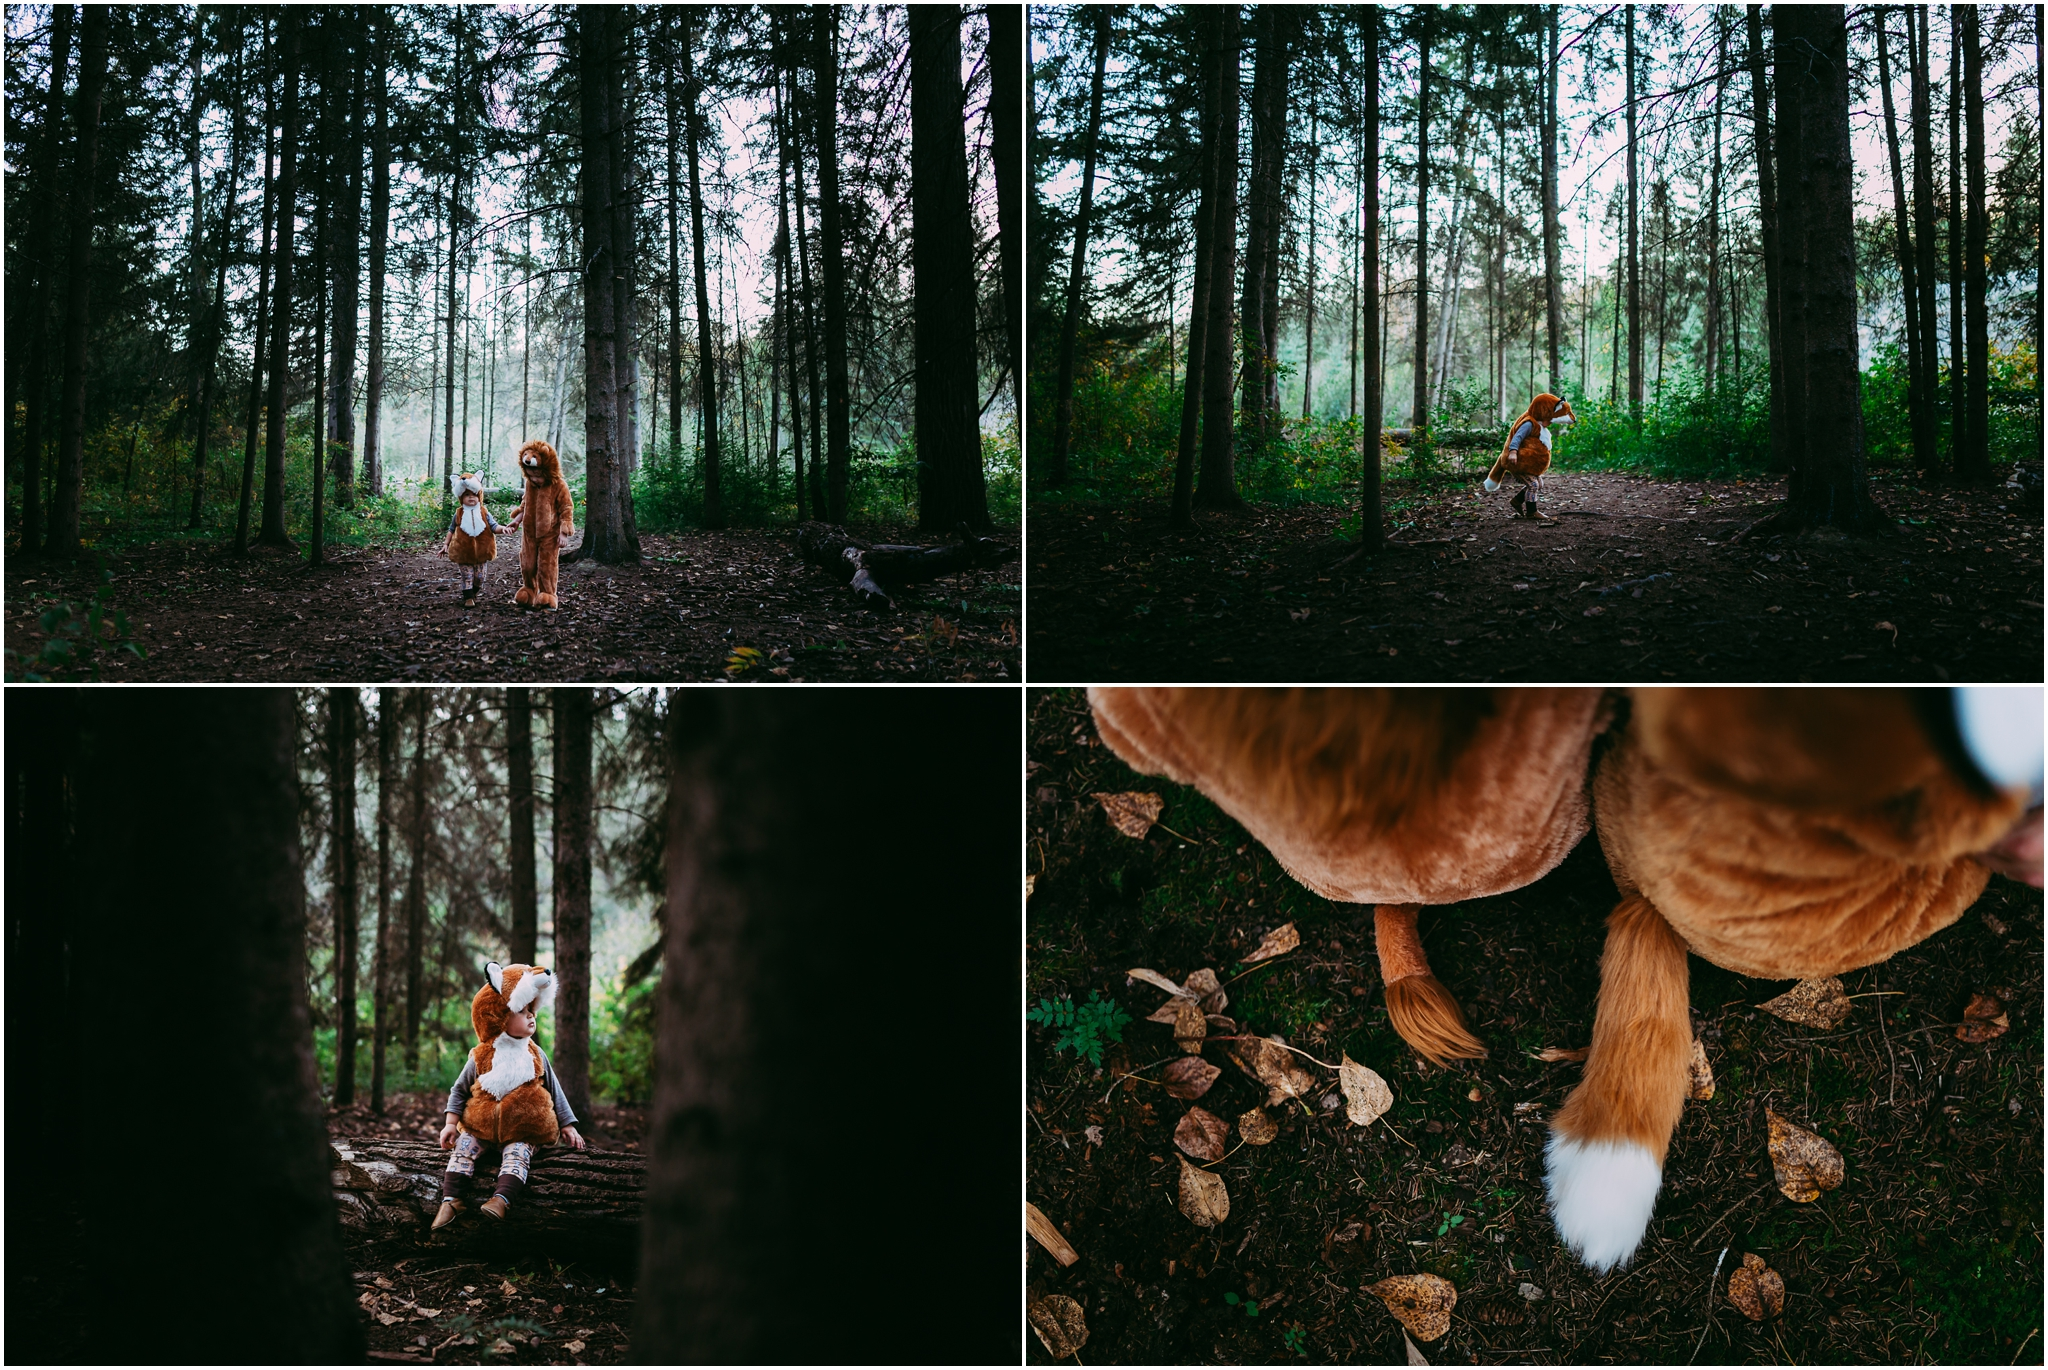 Edmonton Family Lifestyle Photographer - Halloween - Lion - Fox - Costumes - Brothers - YEG - Whitemud Ravine Park